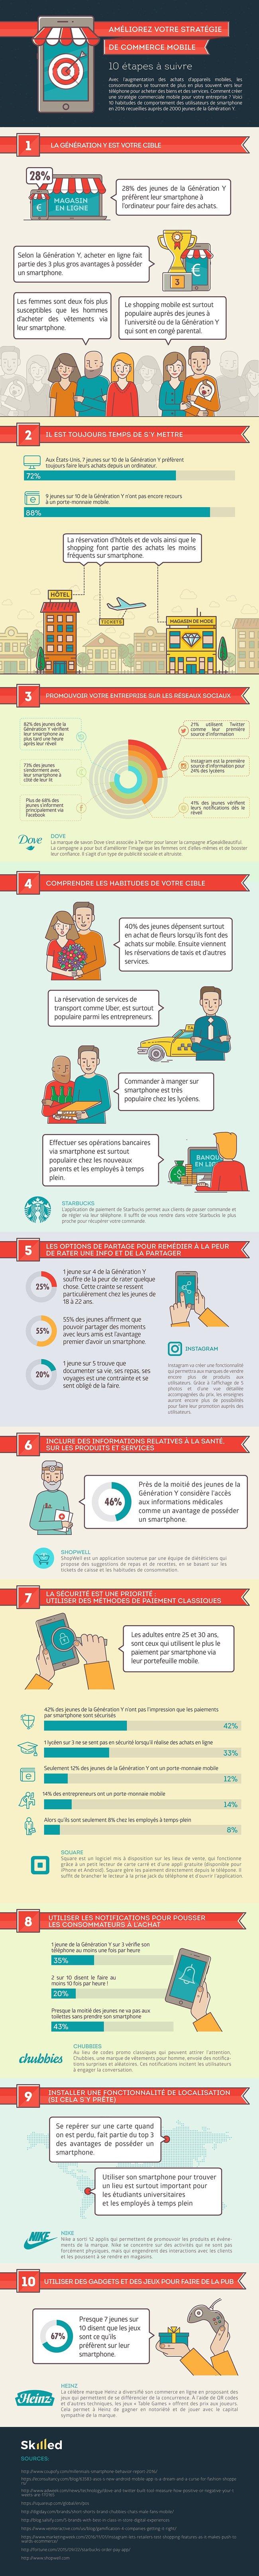 Mobile-Commerce-Strategy-in-10-steps-FR-1000px-1.jpg